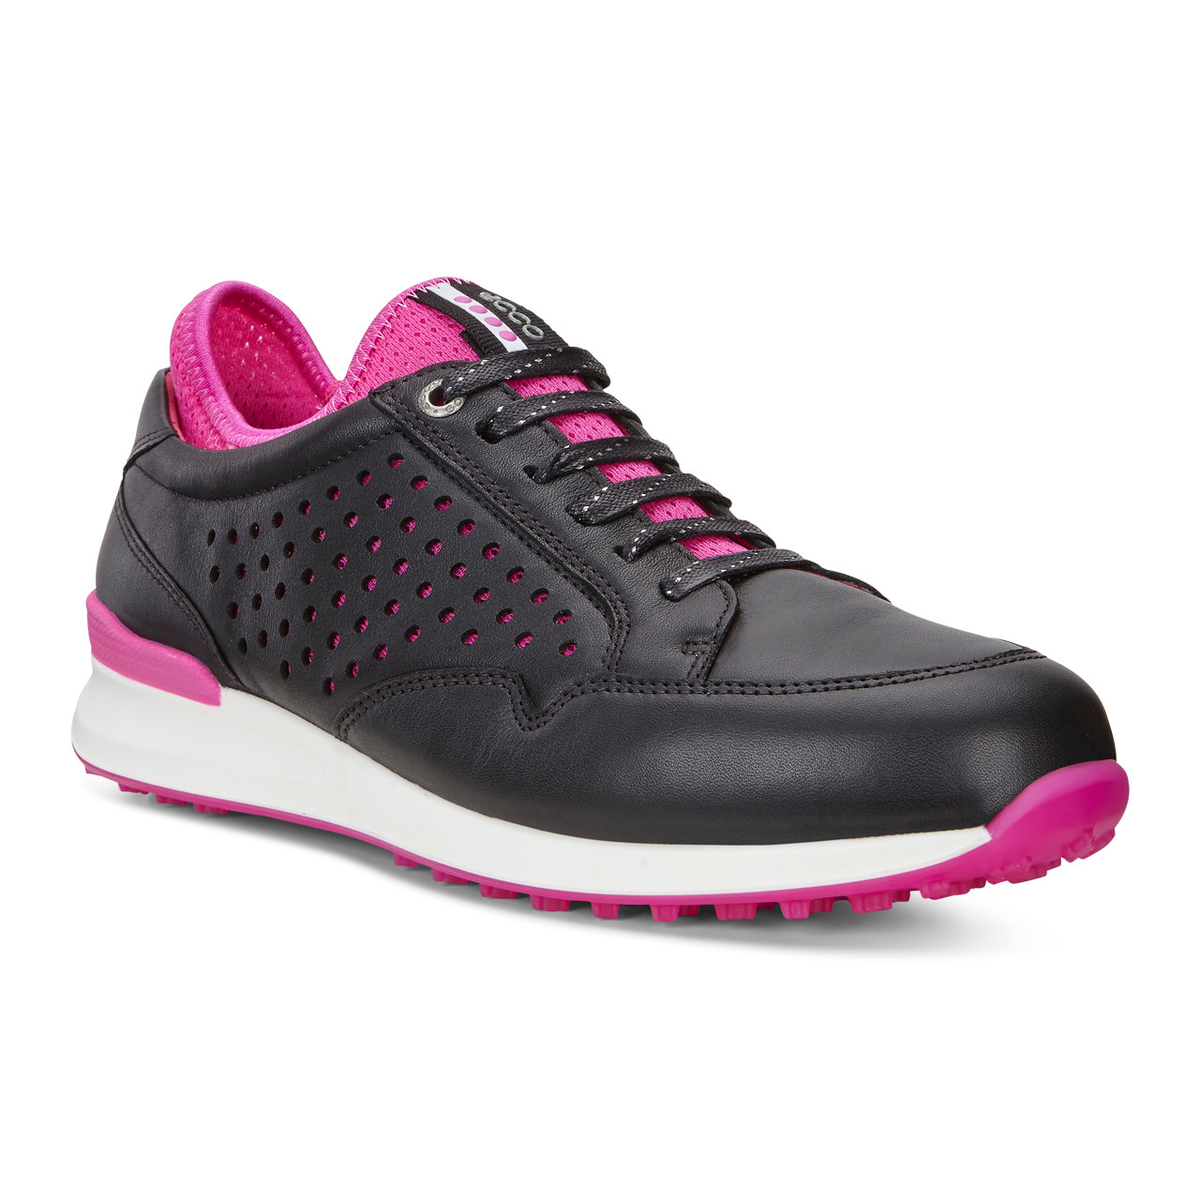 1ecd3bf374 ECCO Speed Hybrid Women's Golf Shoe - Black/Red